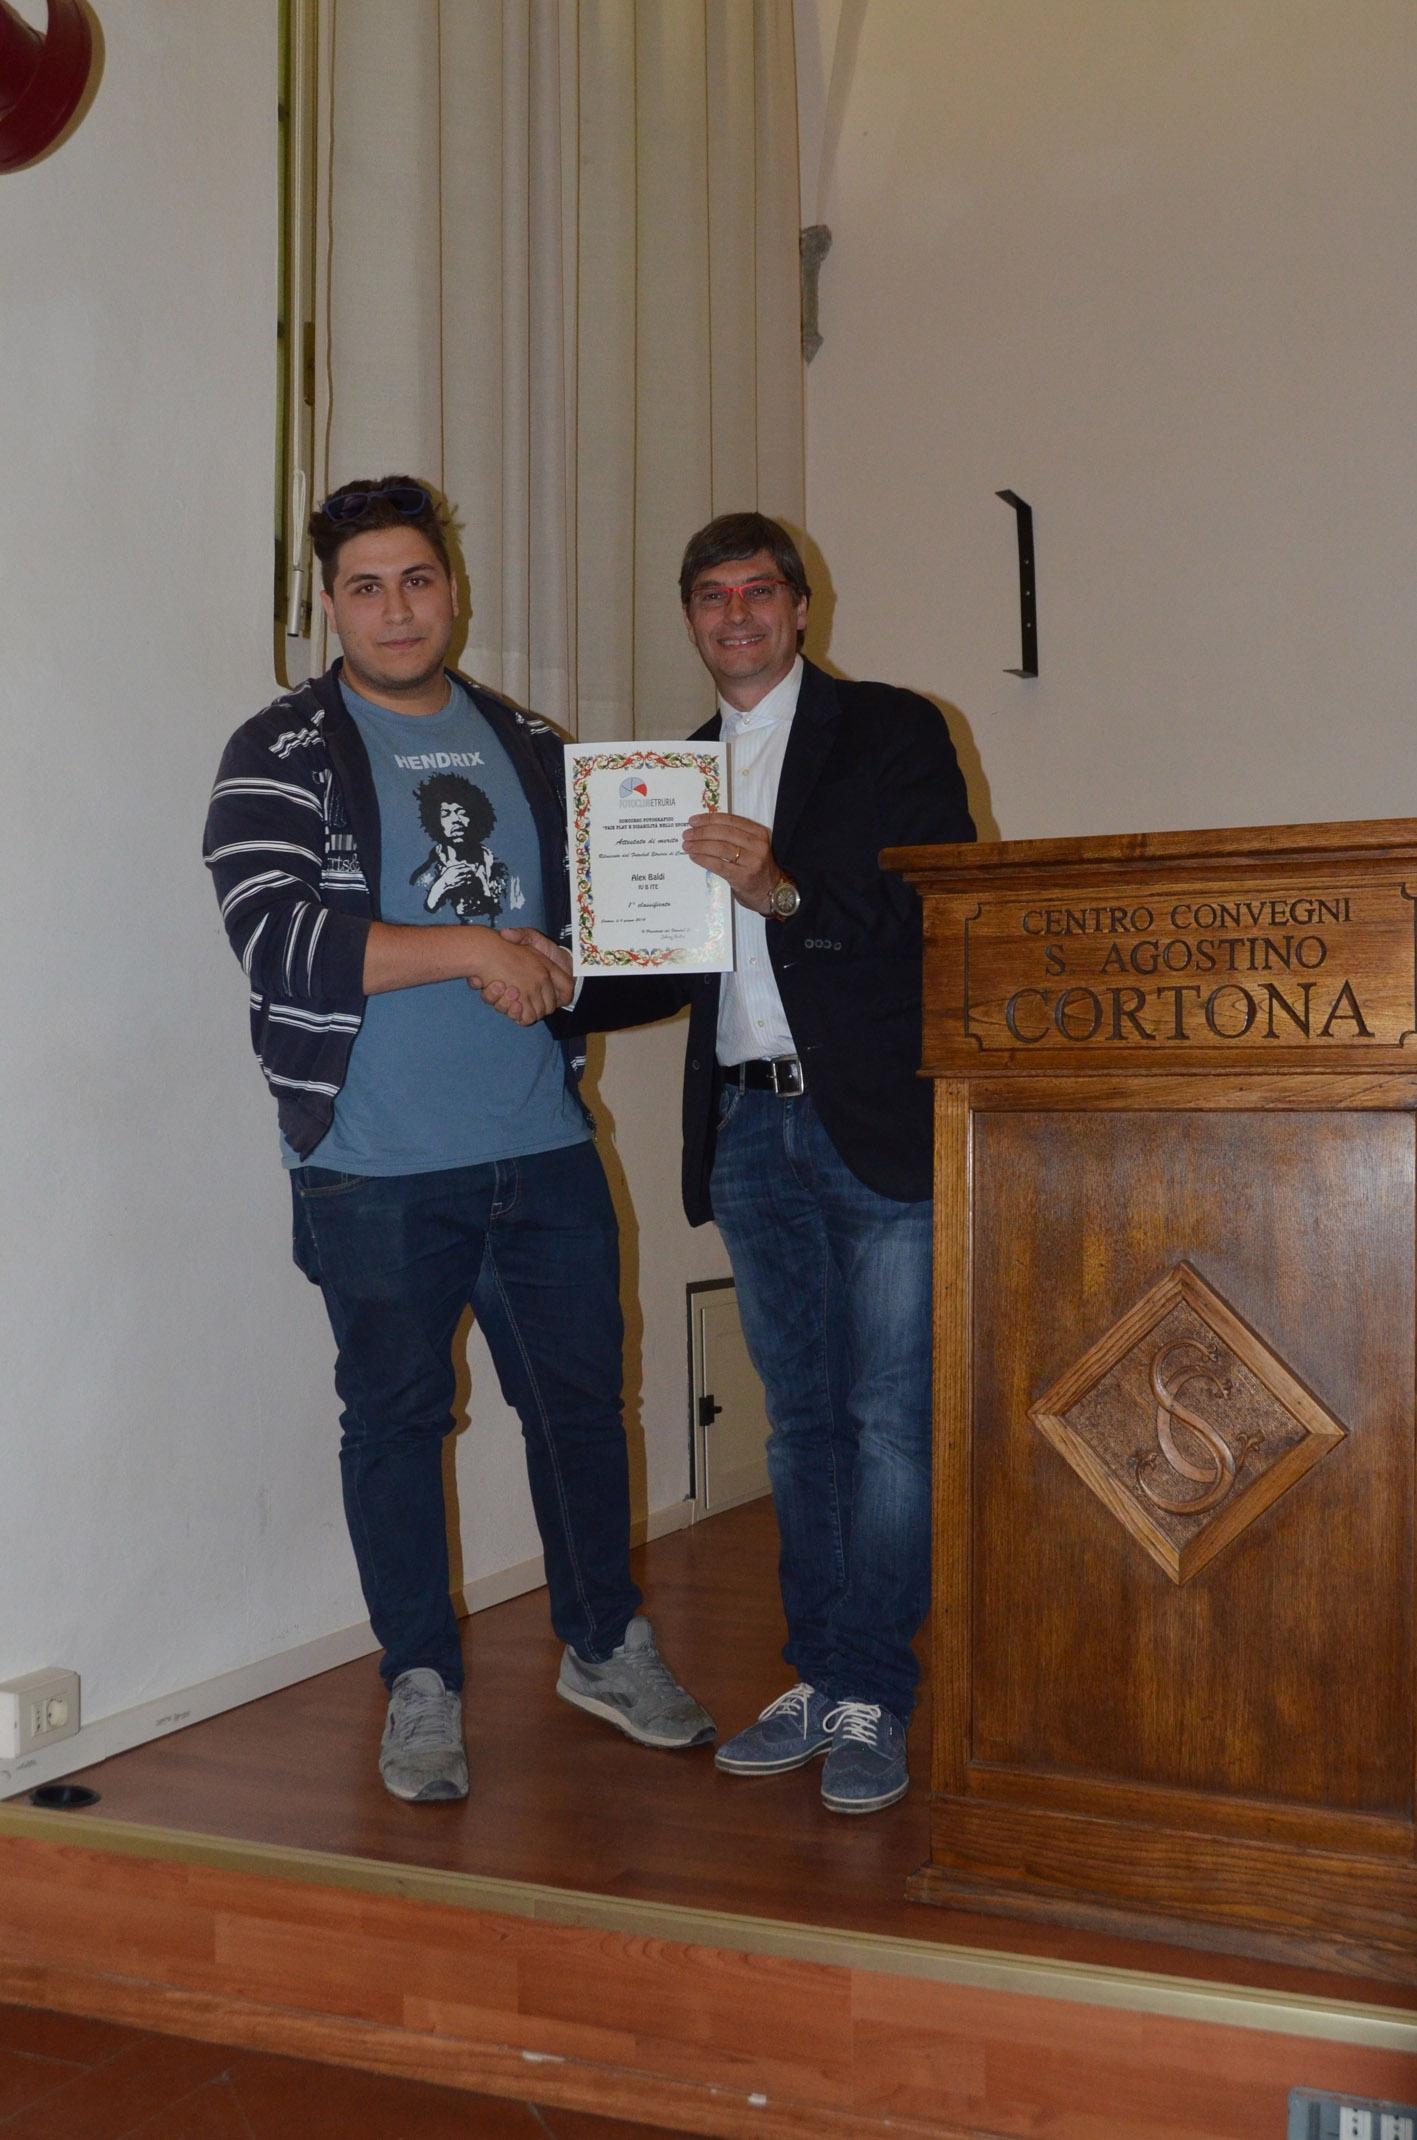 Cortona, studenti-fotografi premiati dal FotoClub Etruria